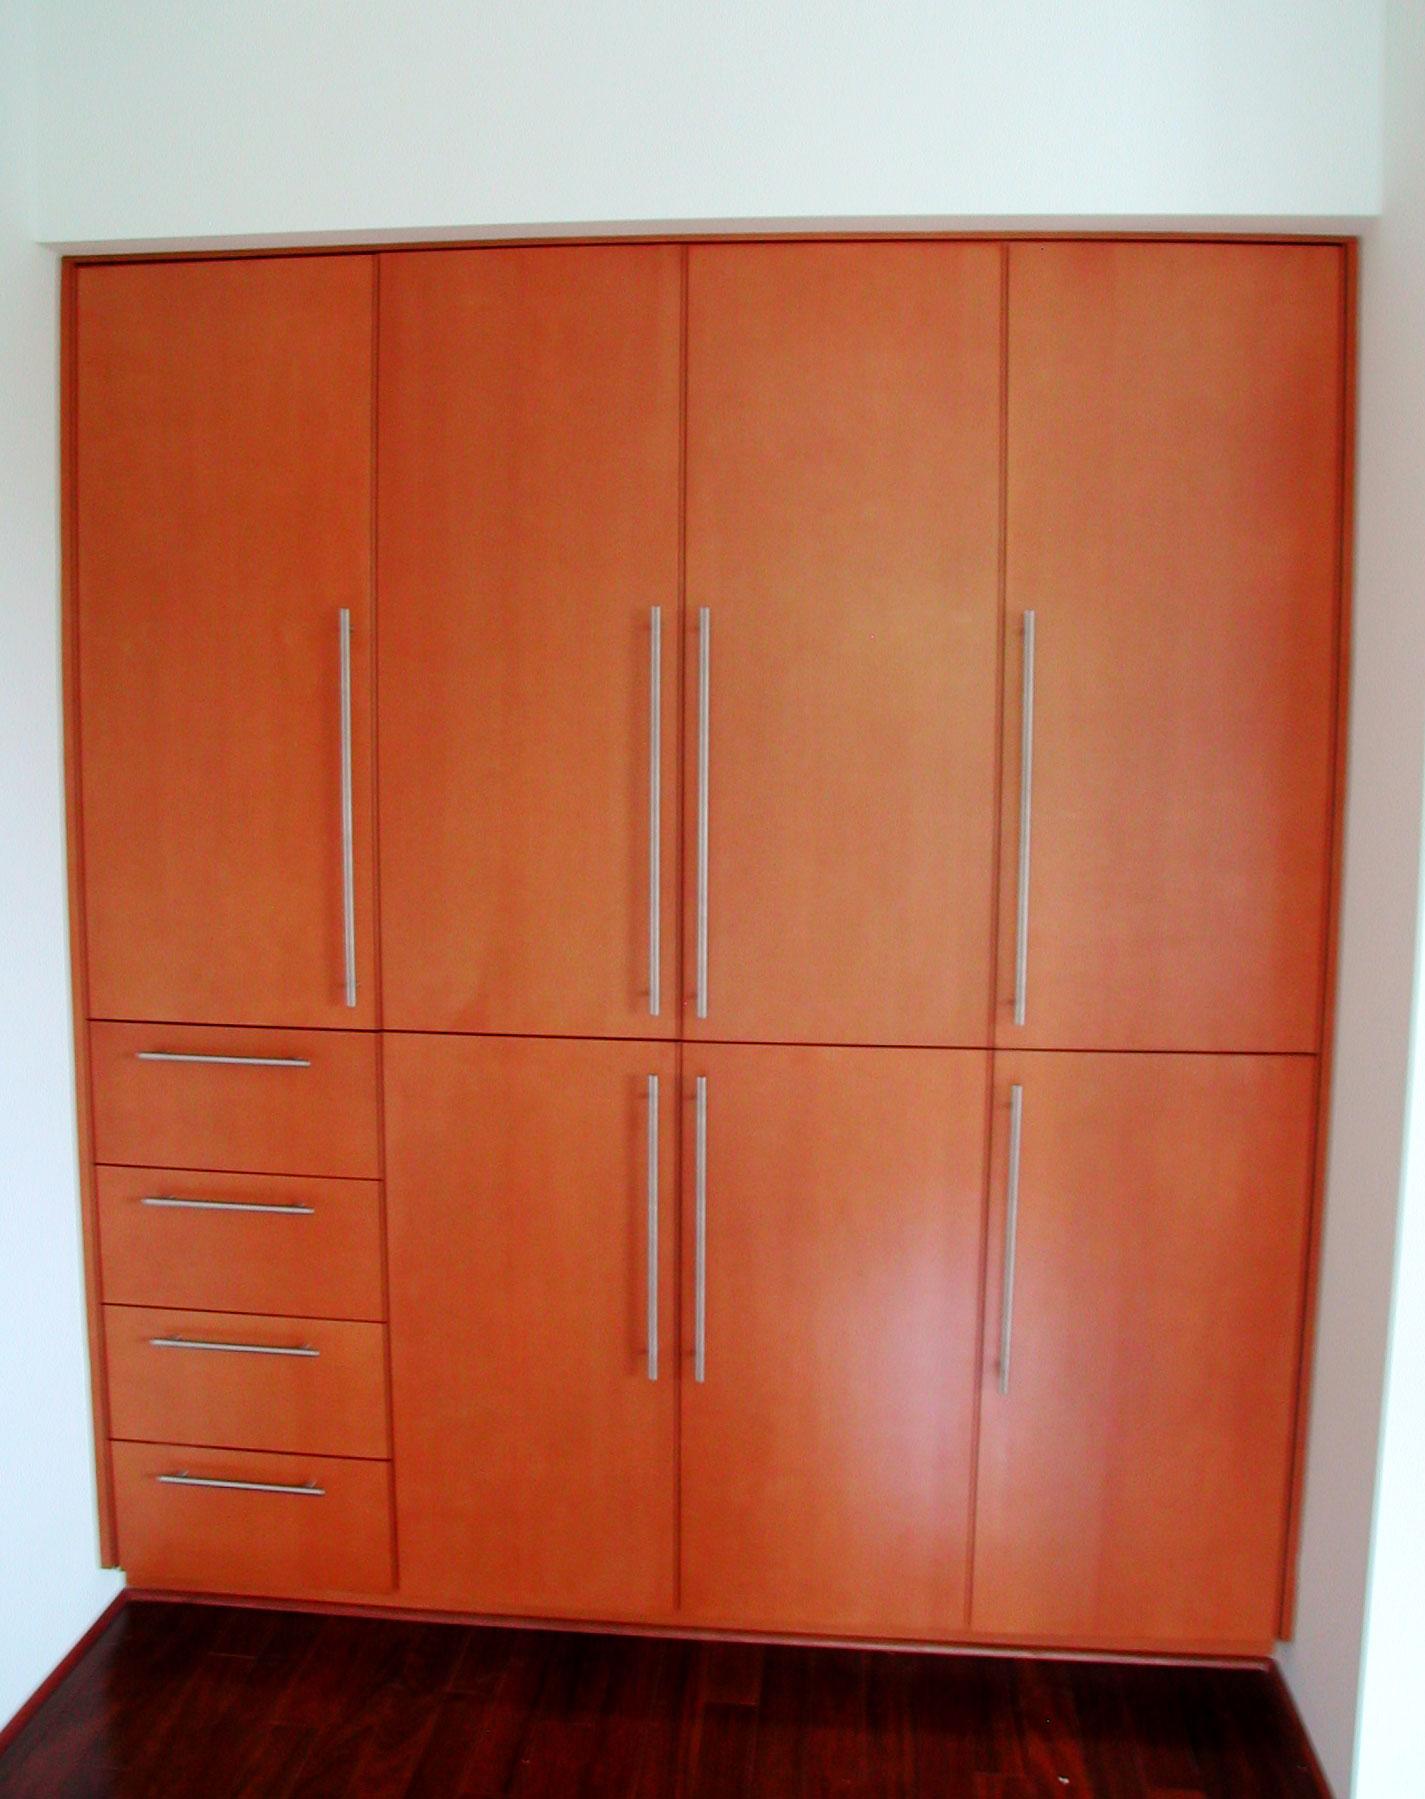 Swell Kehoe Custom Wood Designs Inc Custom Cabinet Makers Download Free Architecture Designs Salvmadebymaigaardcom